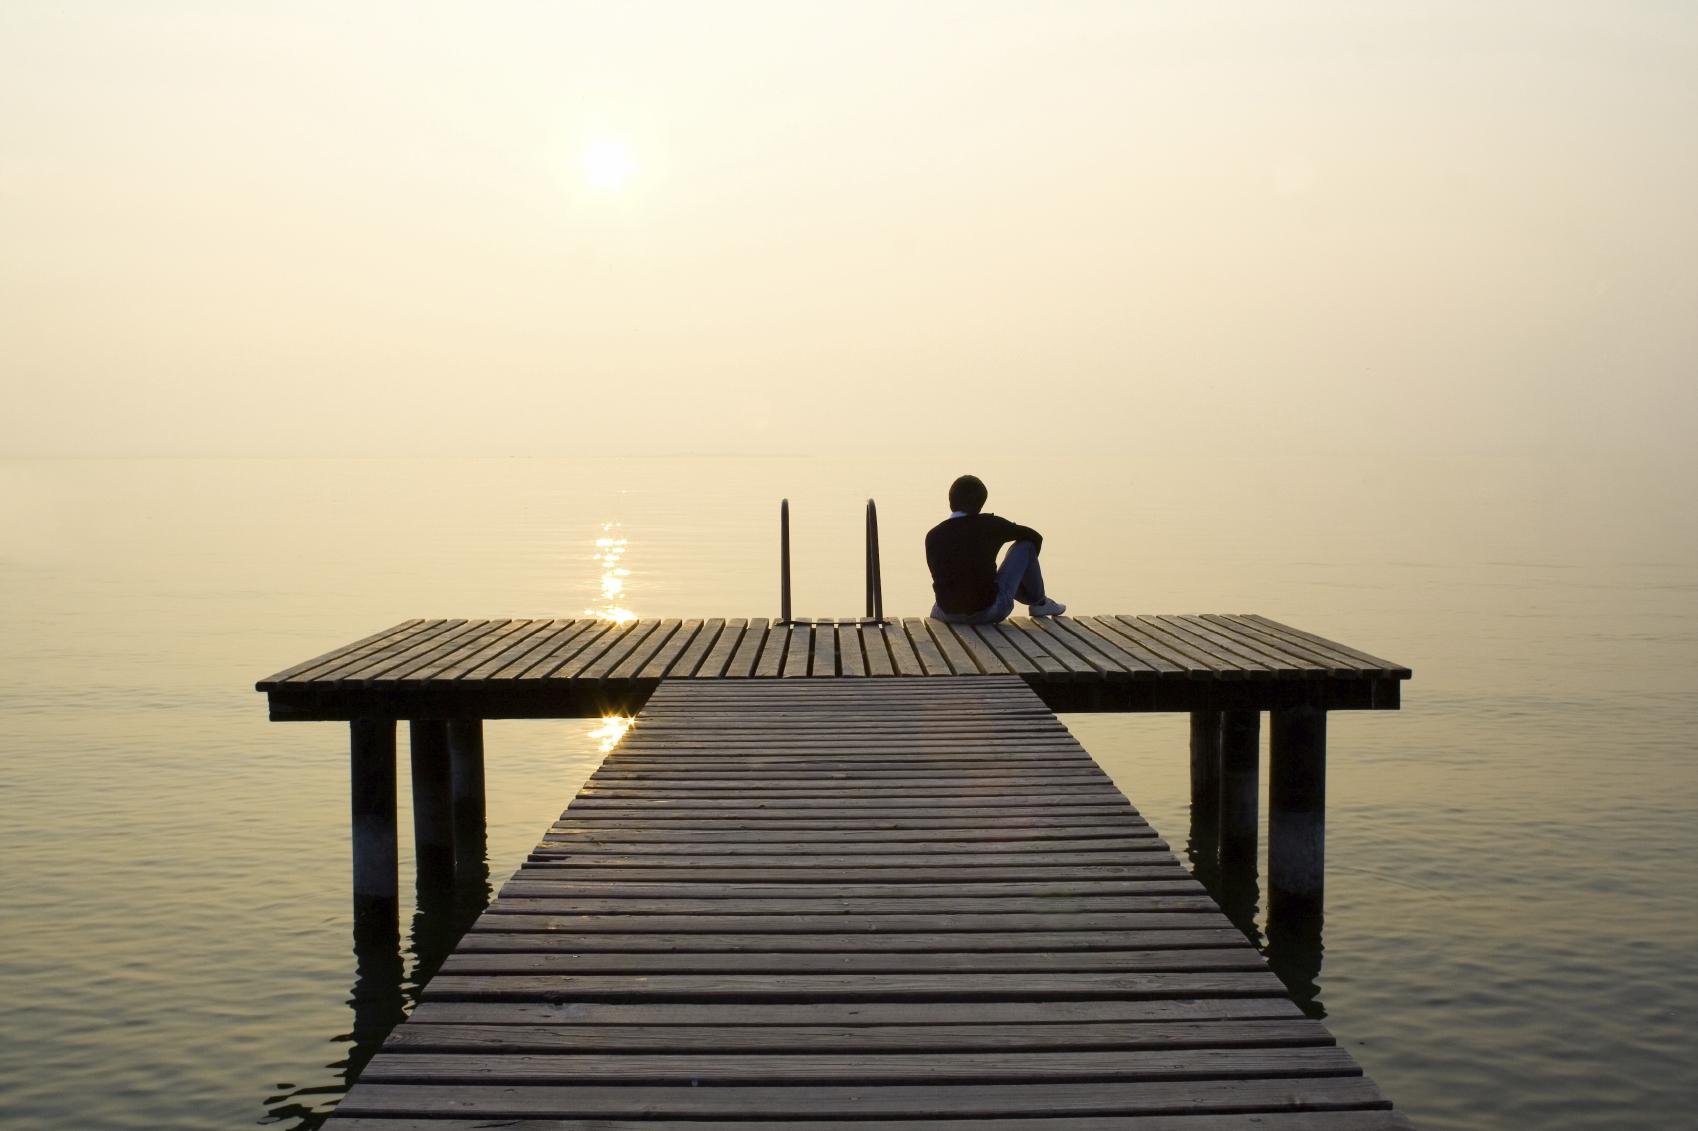 Otis Redding - (Sittin' On) The Dock of the Bay - Radio Paradise ...